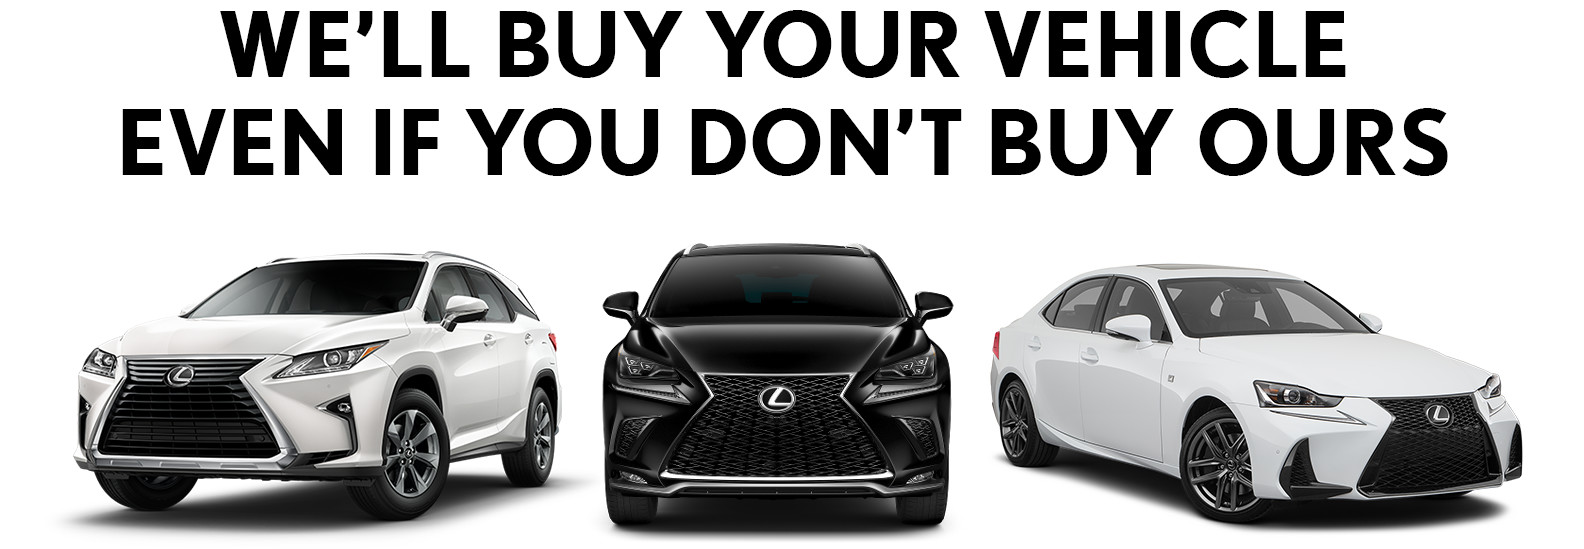 buy-used-cars